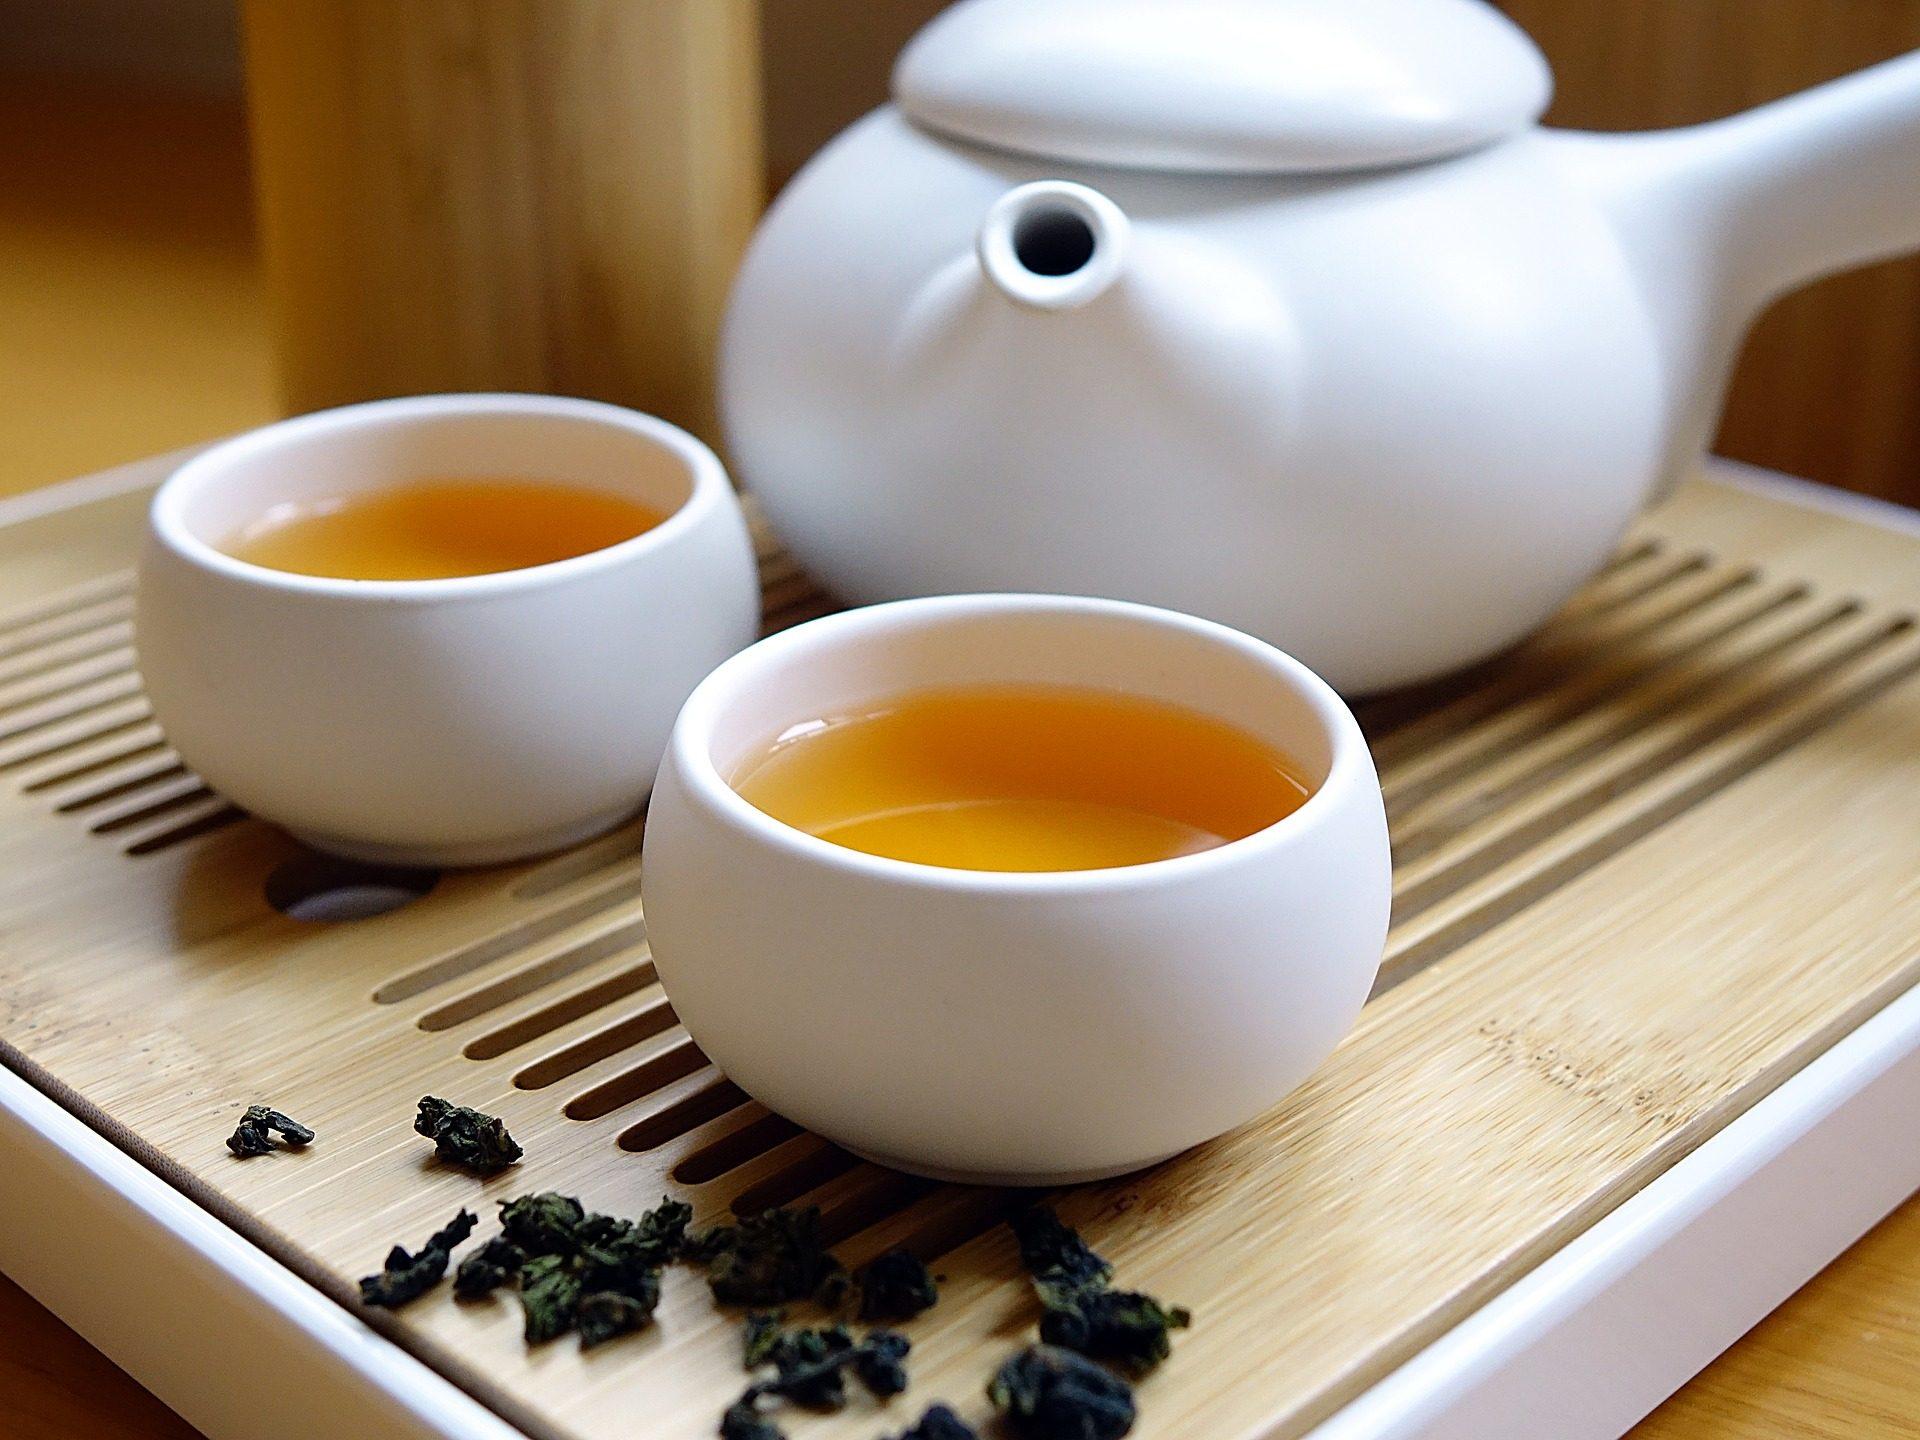 té, chino, tazas, tetera, infusión, ceremonia - Fondos de Pantalla HD - professor-falken.com